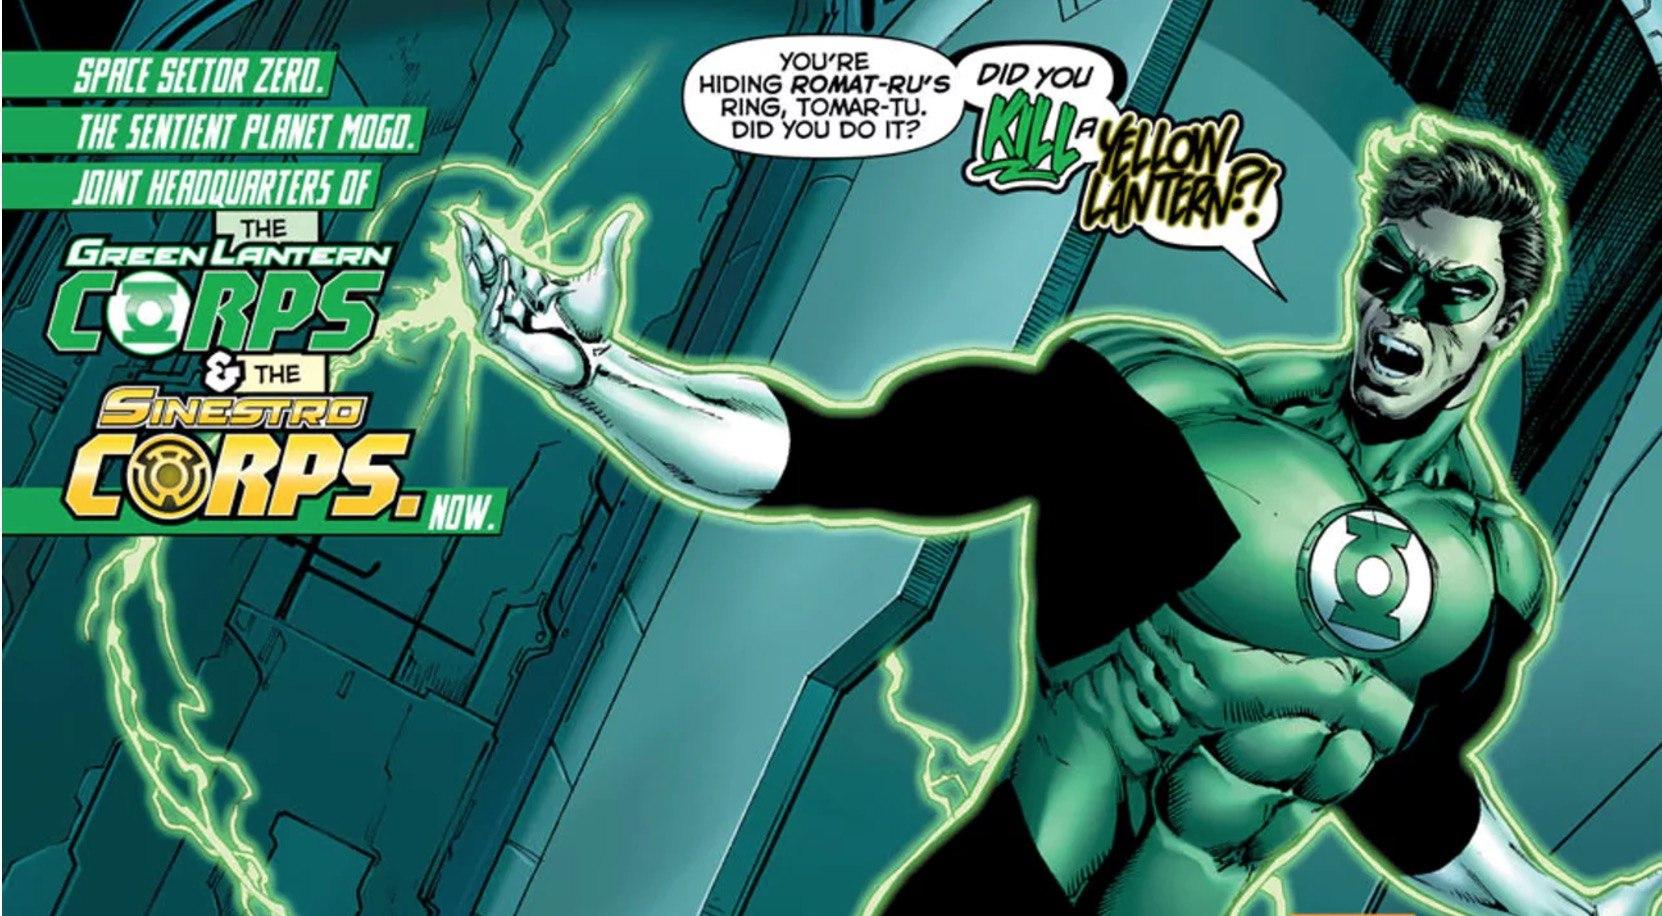 Hal Jordan and the Green Lantern Corps #24 Panel